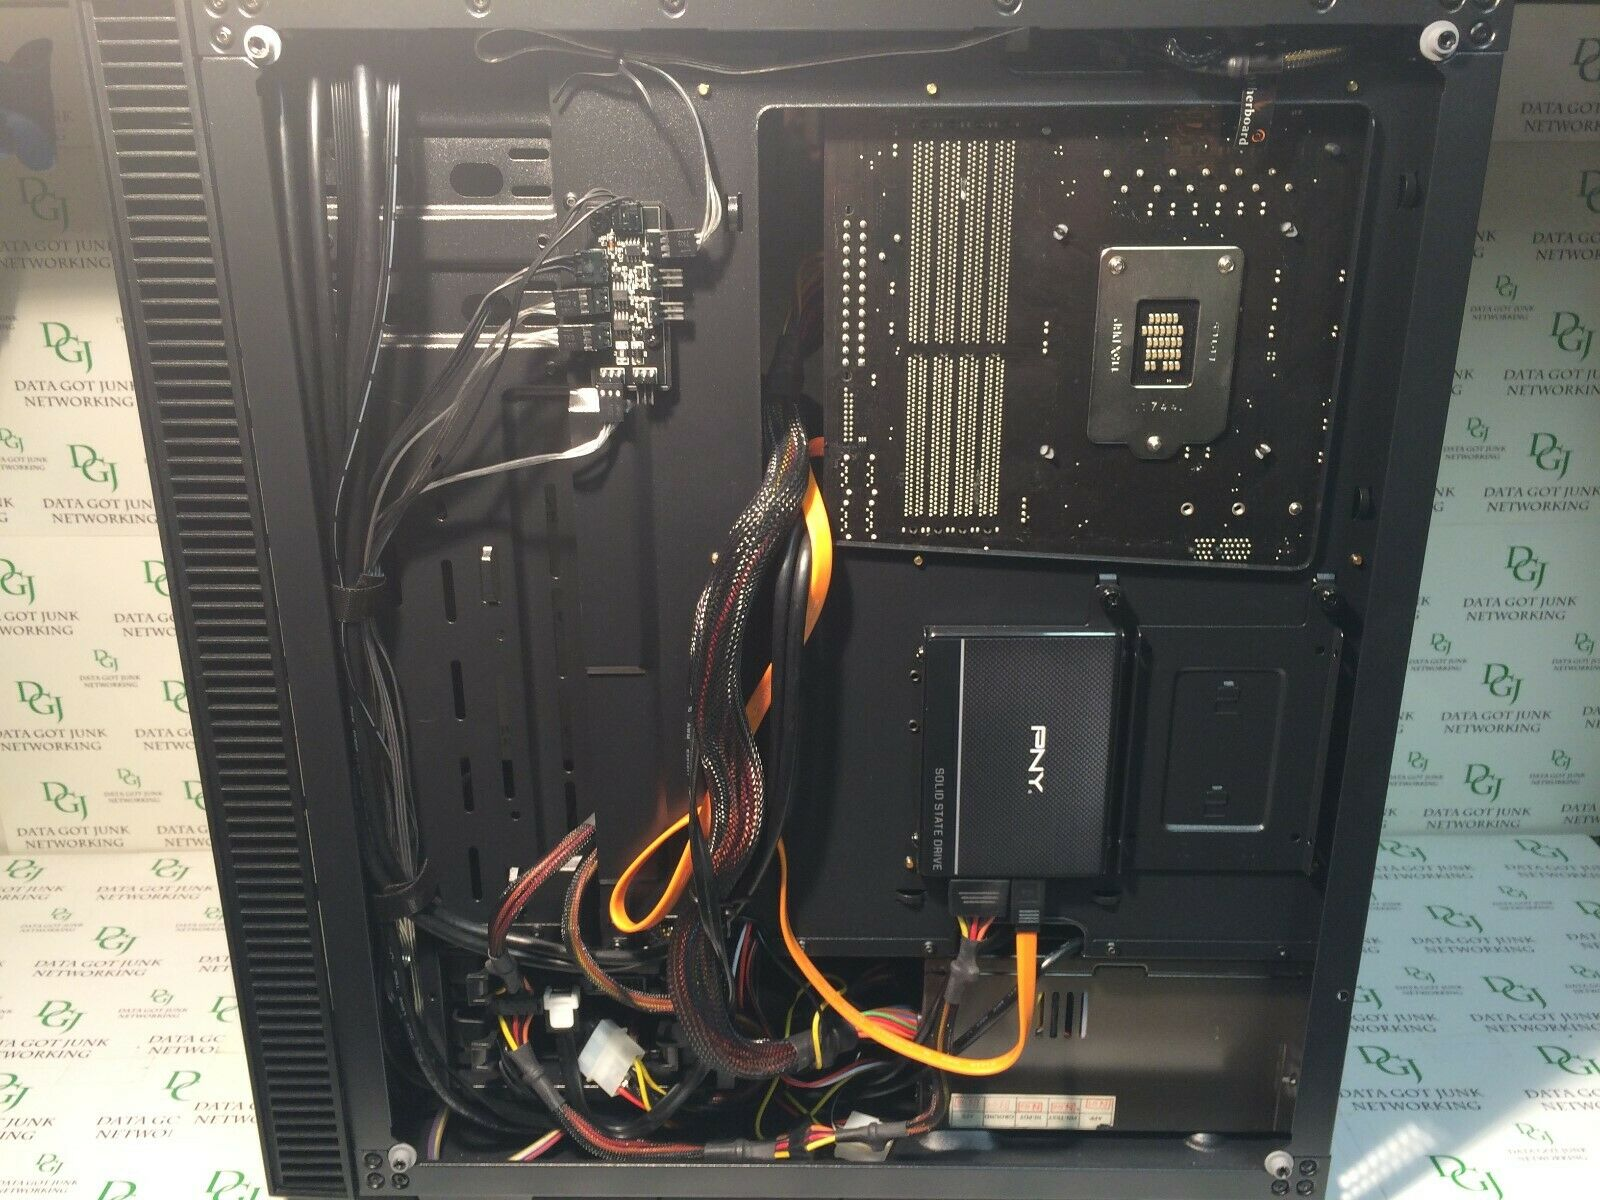 GIGABYTE EVGA GTX 960 Custom Build Gaming Desktop Computer